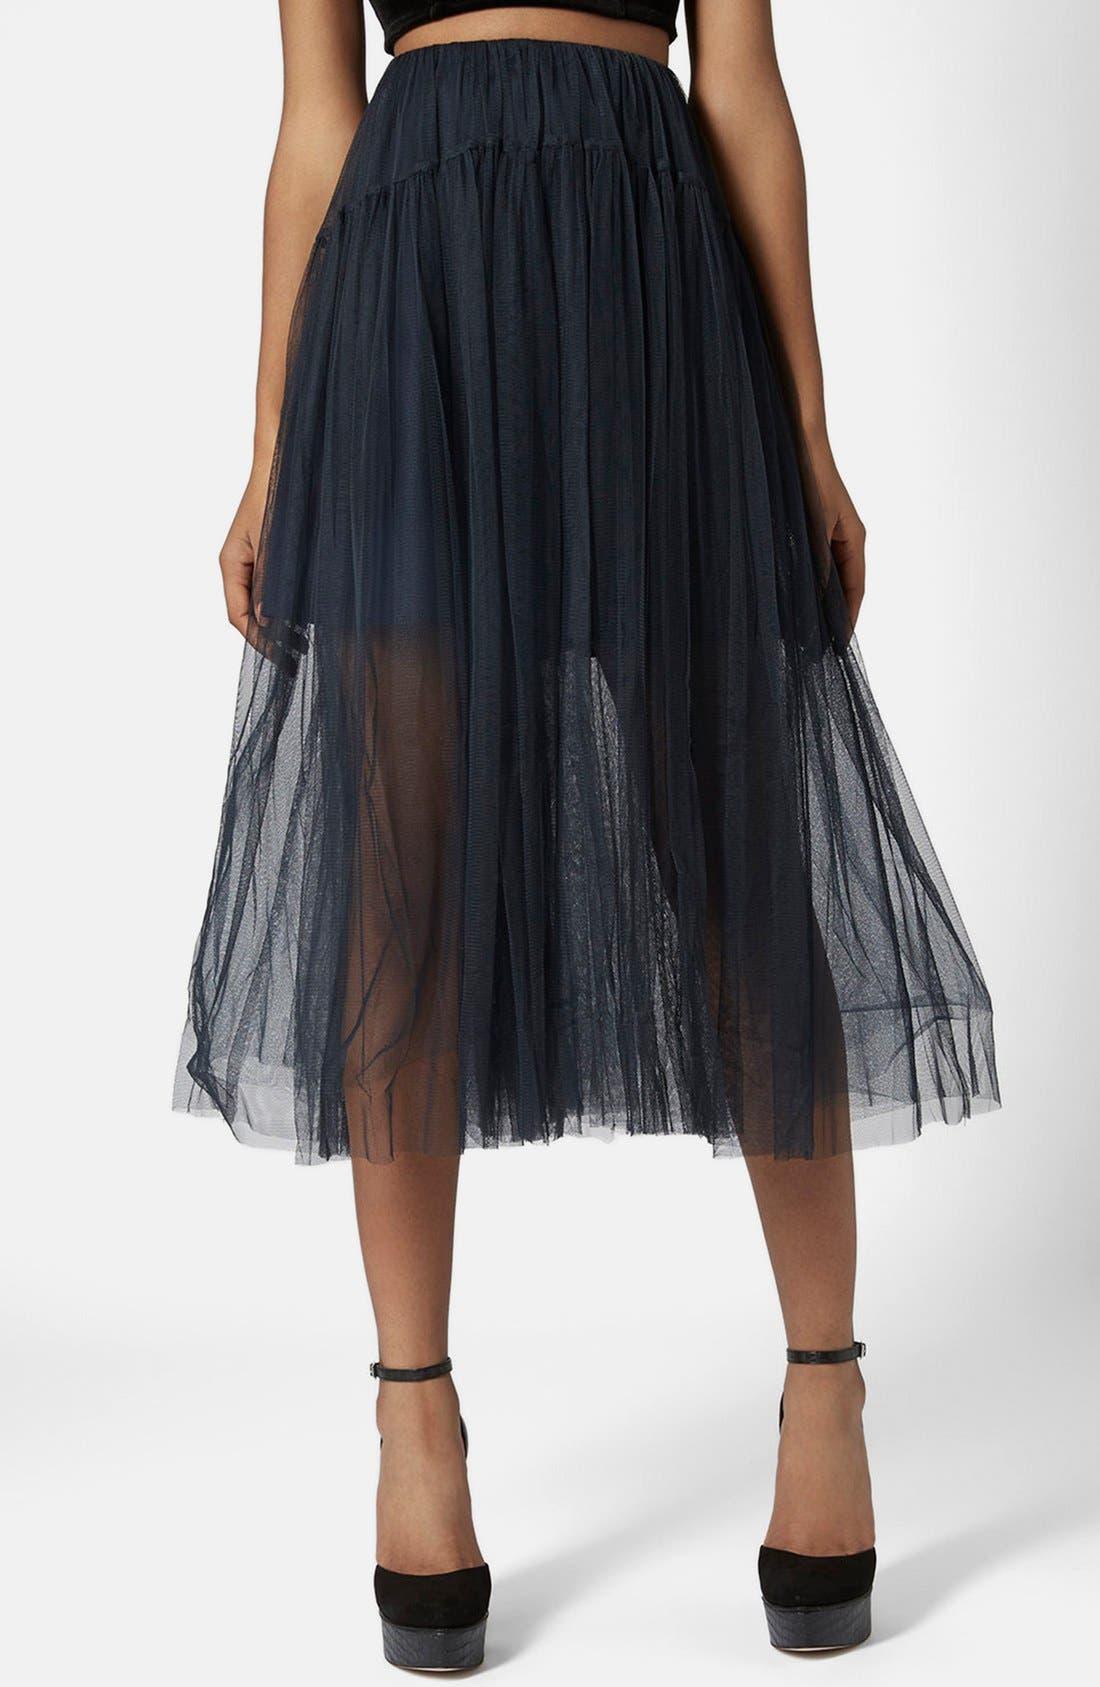 Alternate Image 1 Selected - Topshop Layered Mesh Skirt